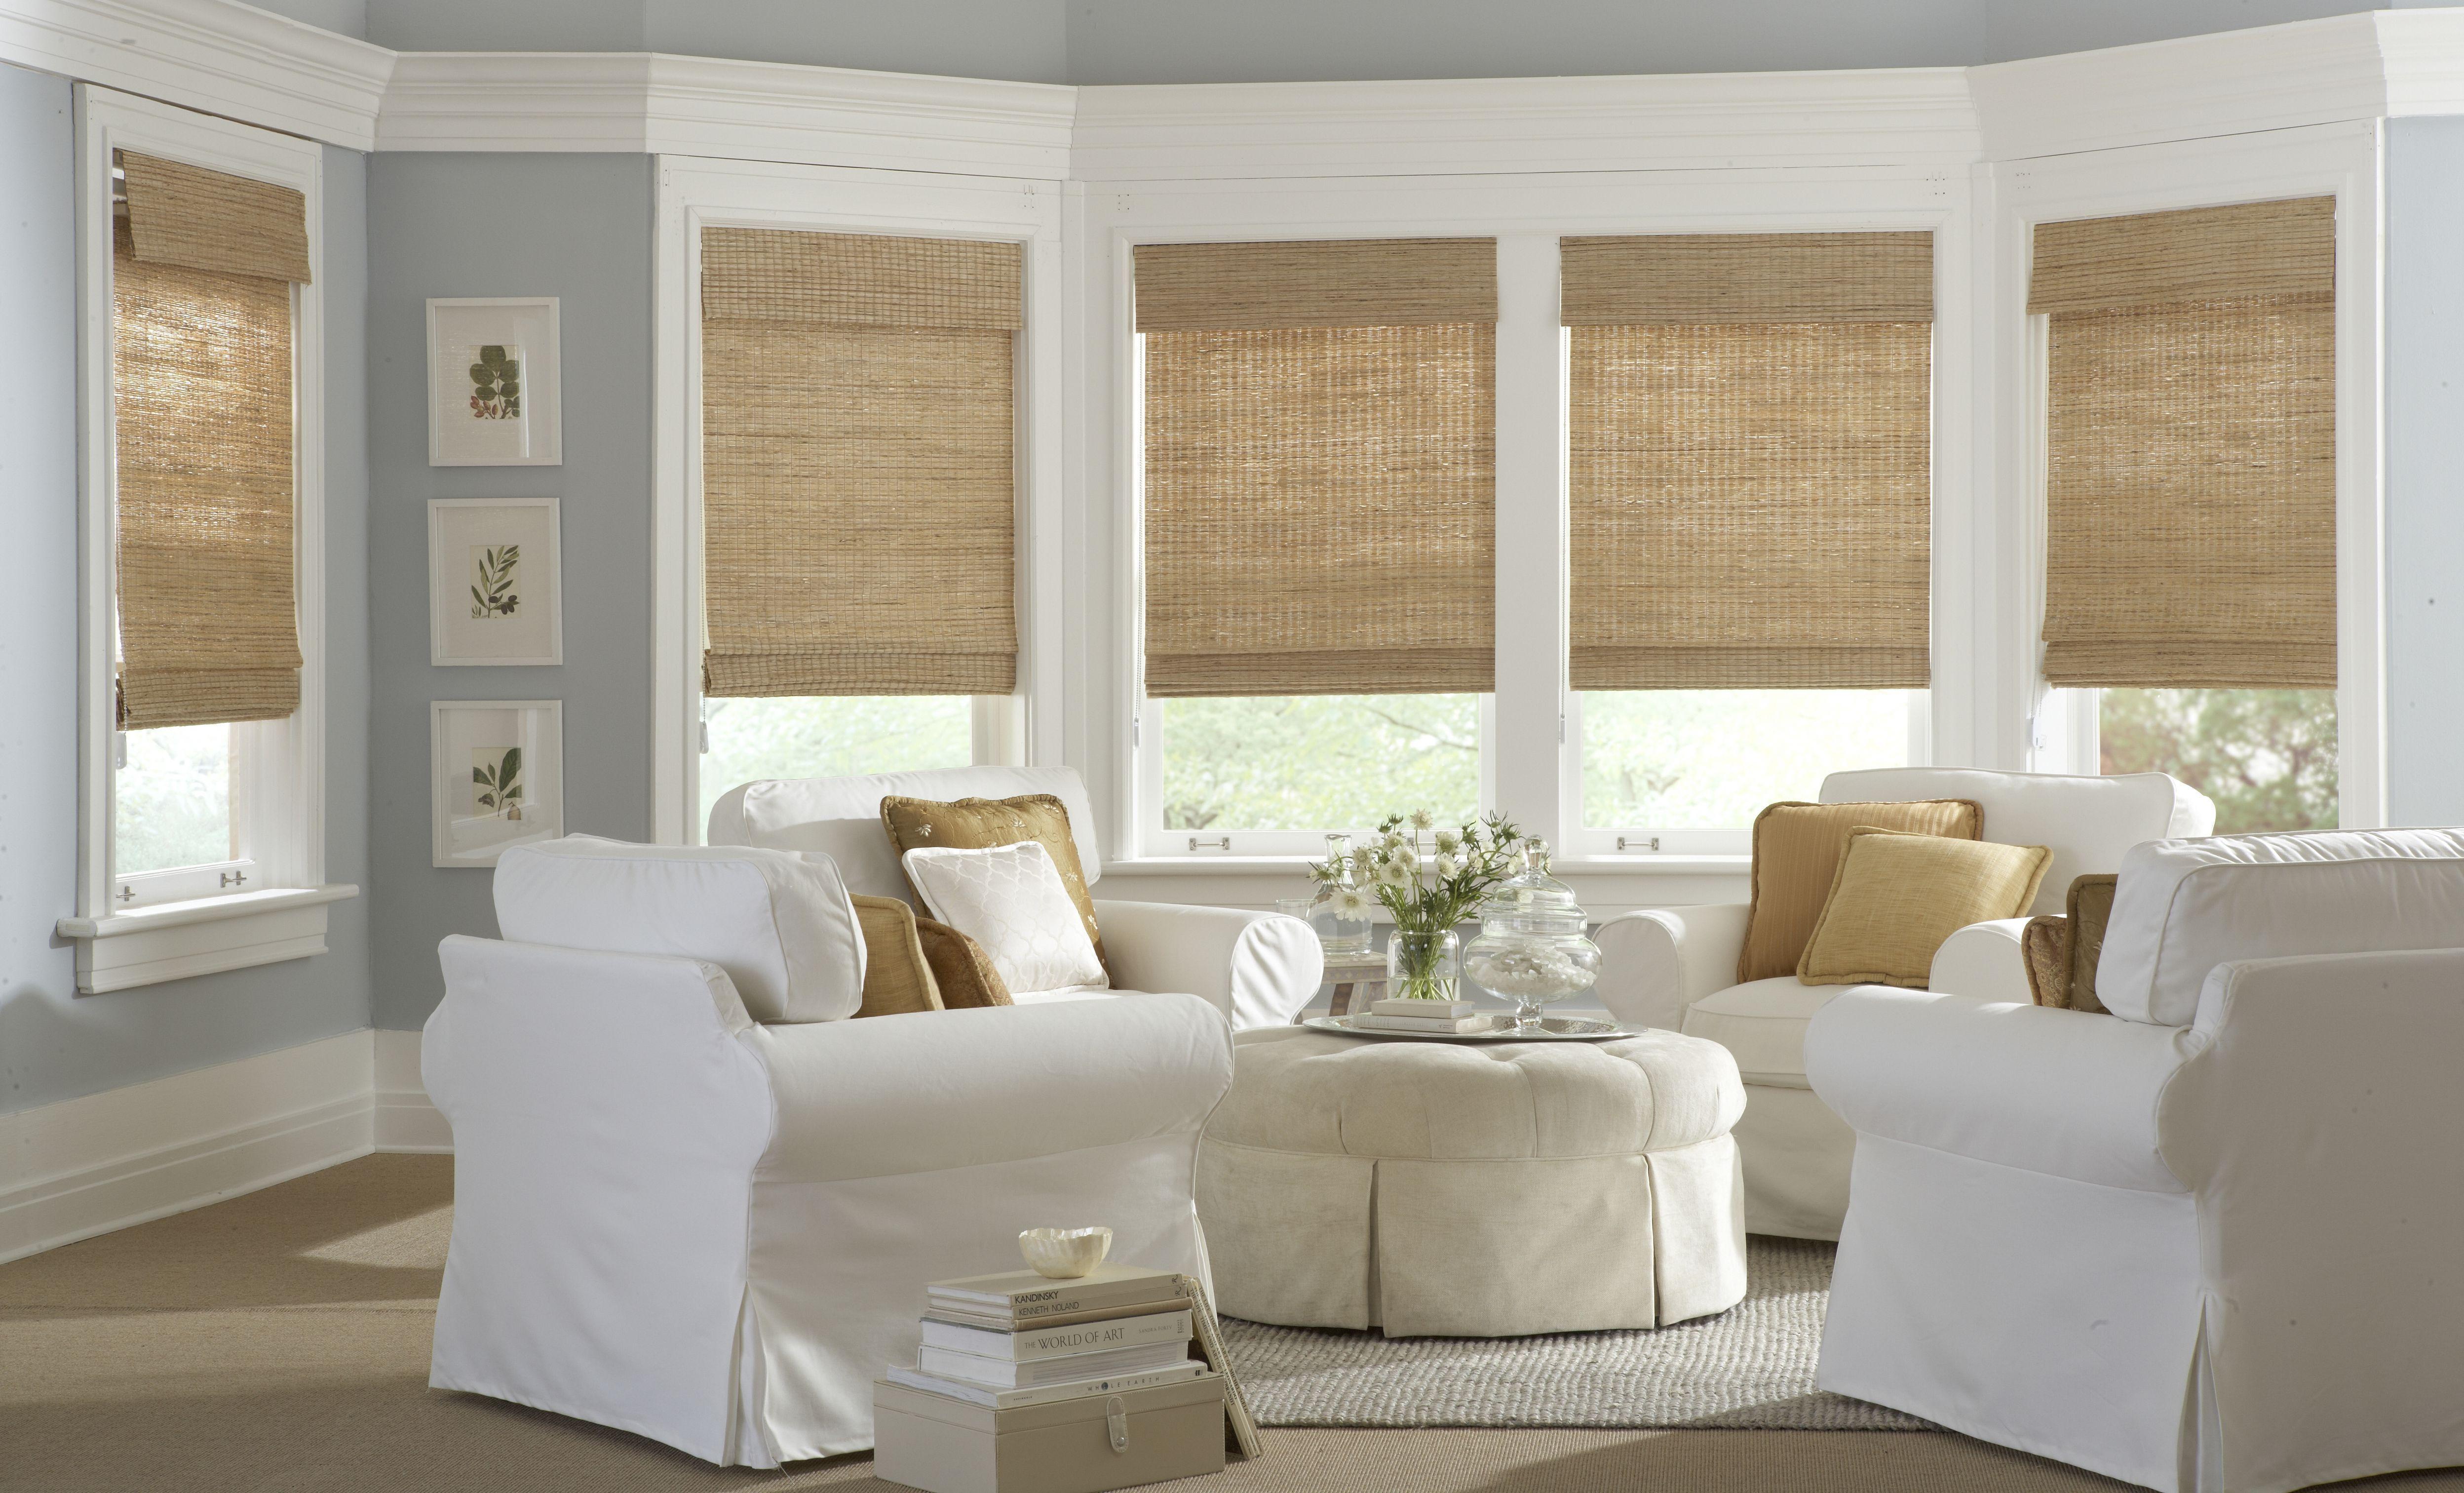 Zonwering Slaapkamer 14 : 3 wonderful useful tips: roller blinds brown sheer blinds john lewis